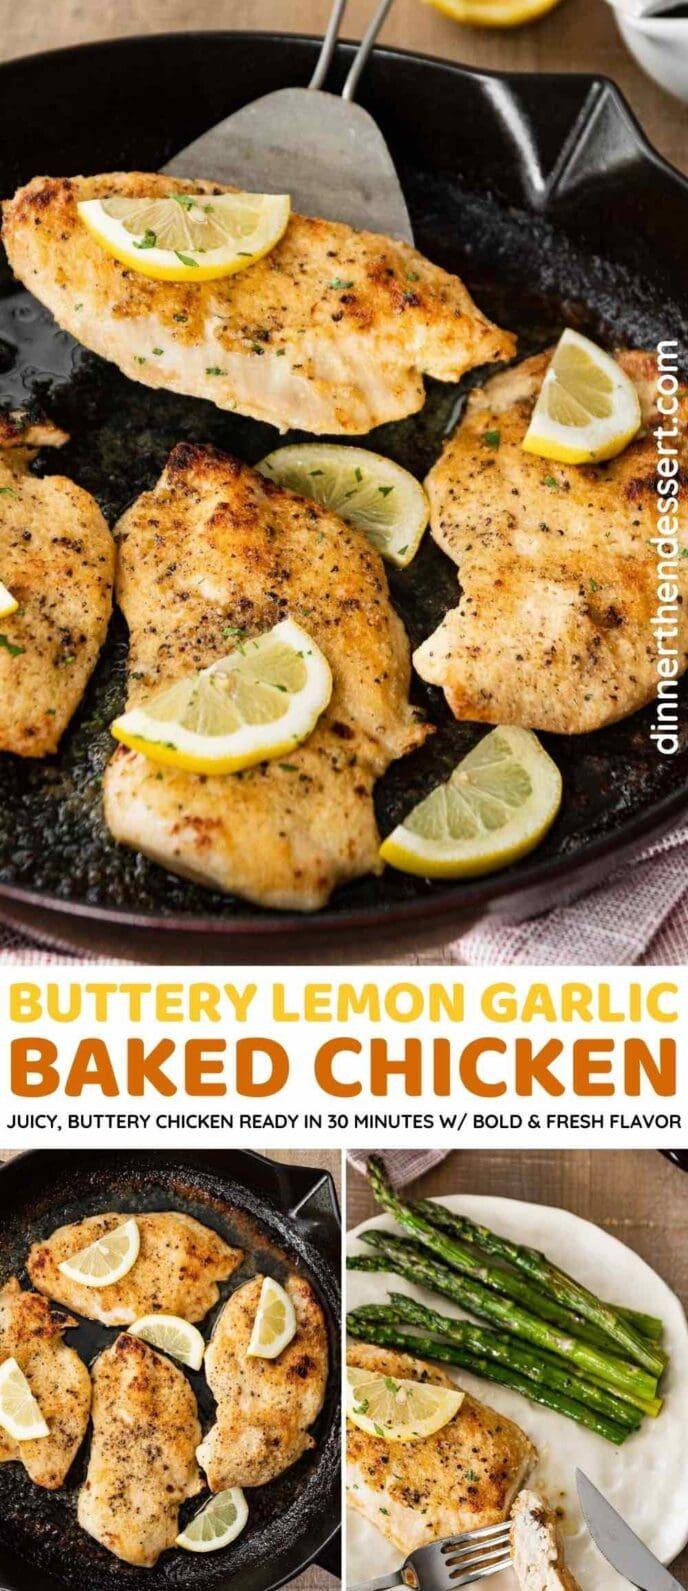 Buttery Lemon Garlic Baked Chicken collage